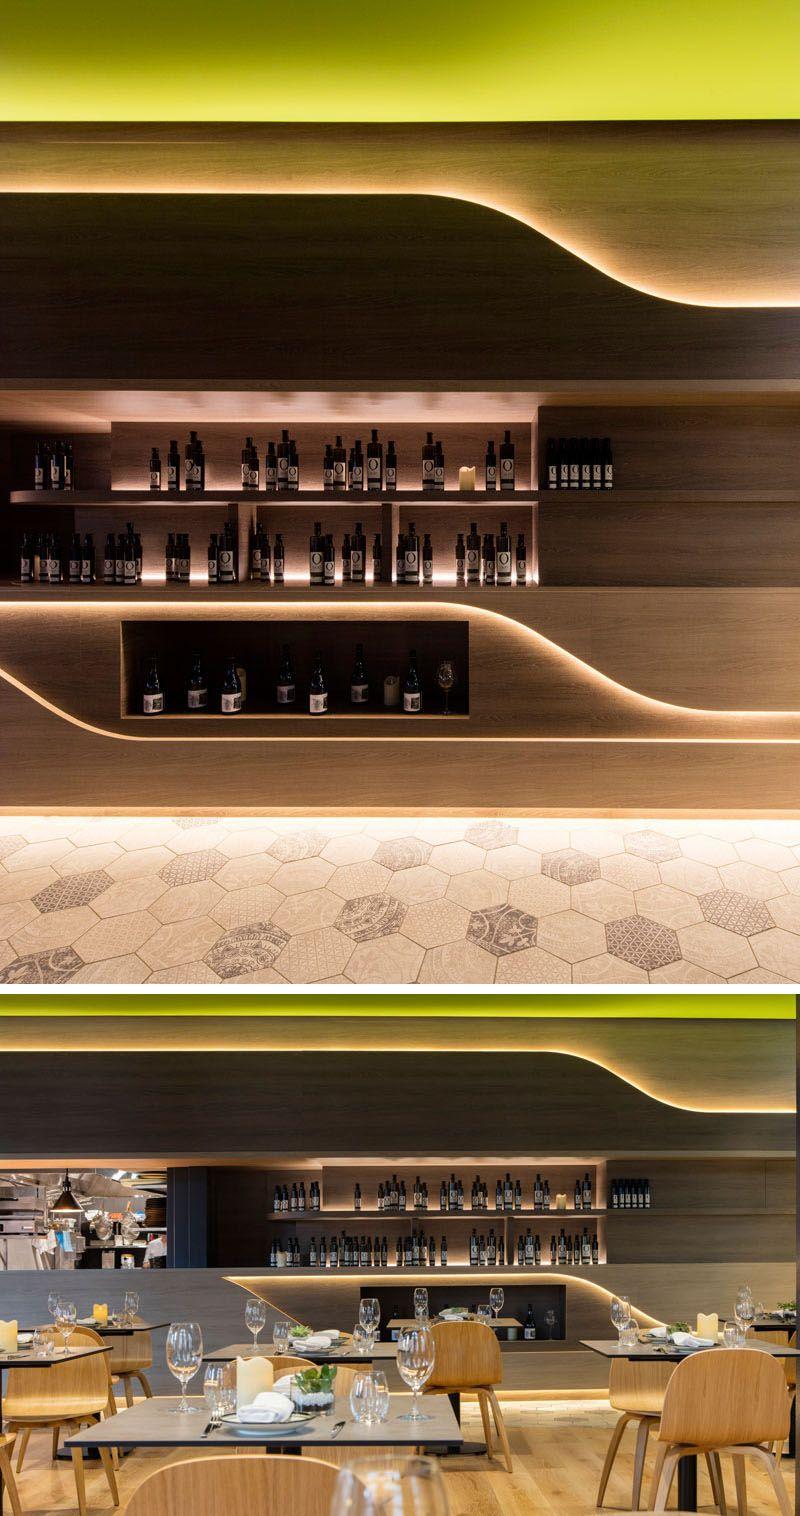 Interior Lighting Design Ideas - A wall of hidden LED lights behind on restaurant and bar, restaurant bar area, under bumper light bar led, light-up coasters led, restaurant bar design ideas,